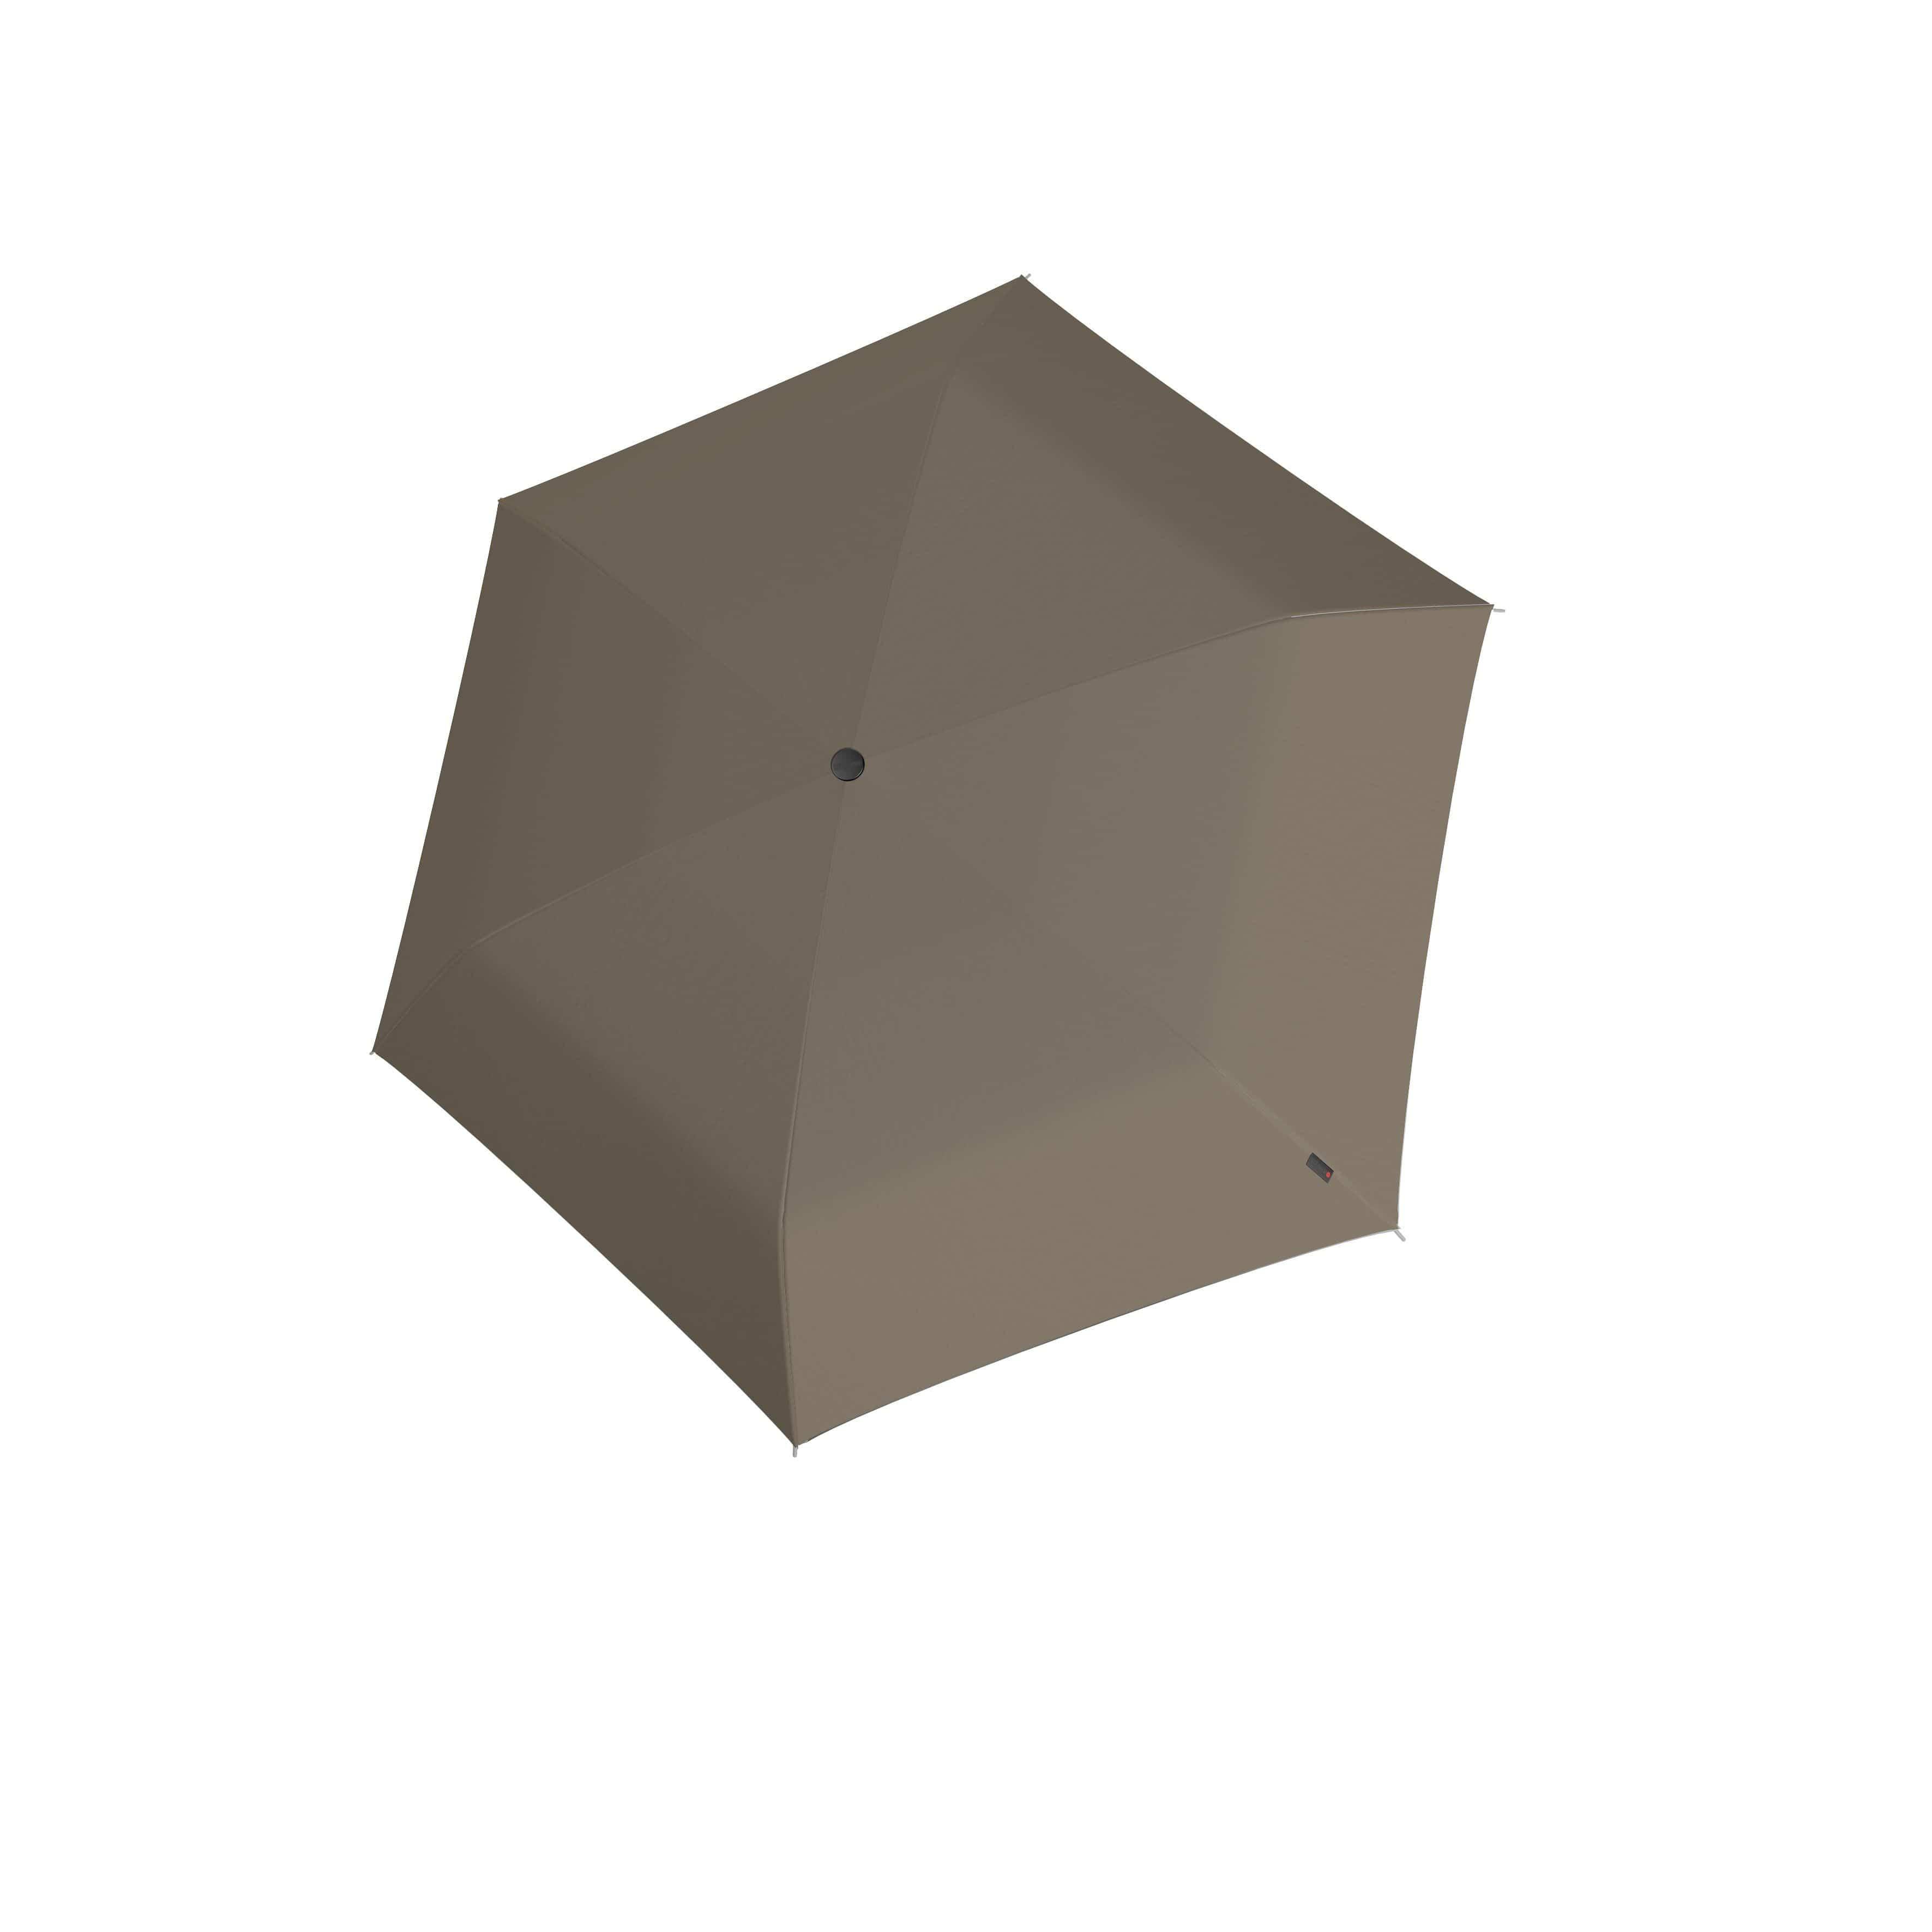 Knirps Umbrella TS.200 slim medium duomatic - photo 2